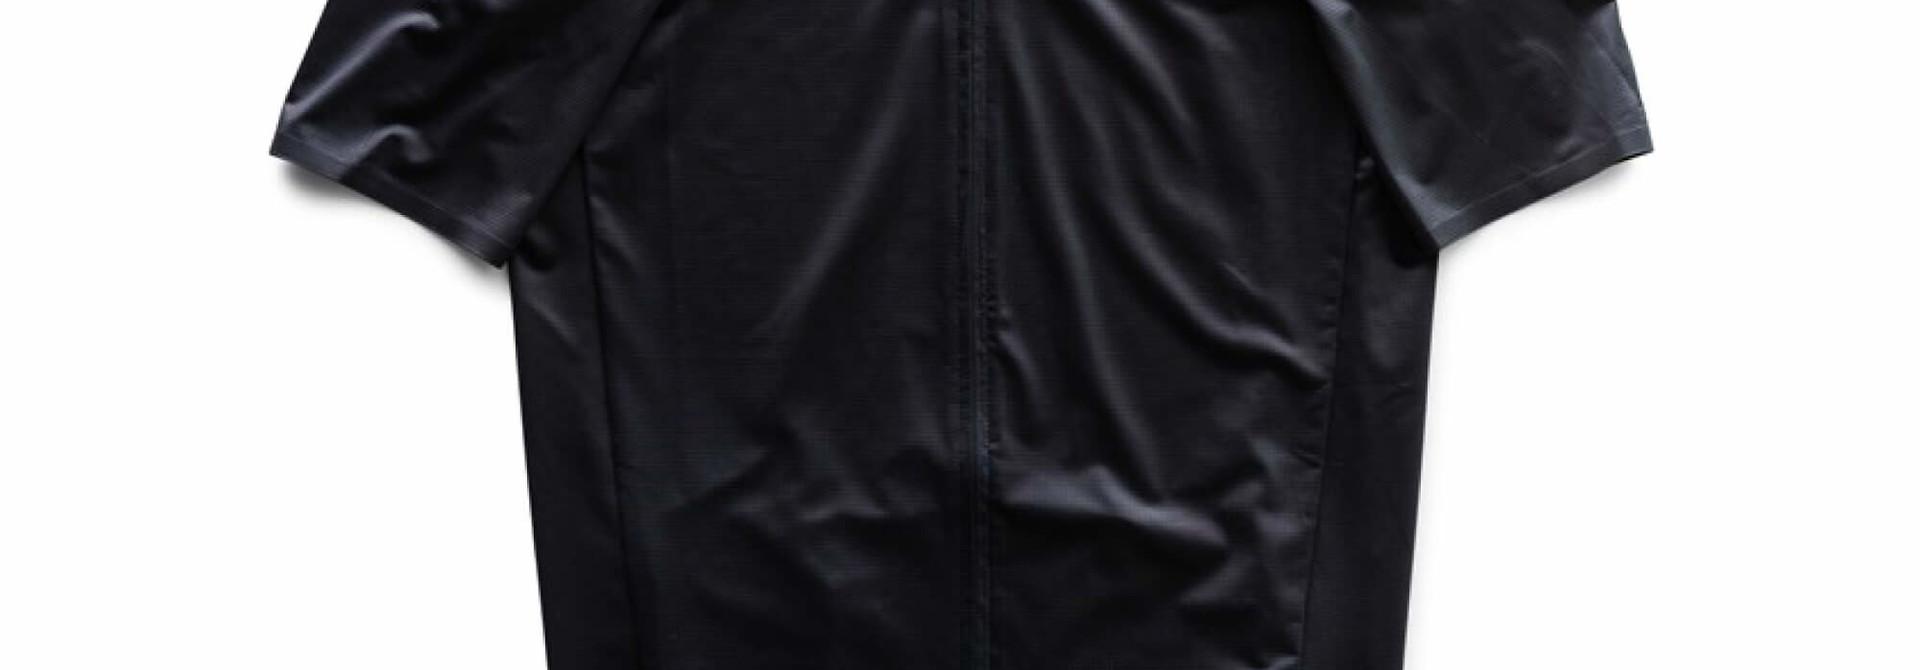 SL Air Jersey Short Sleeve